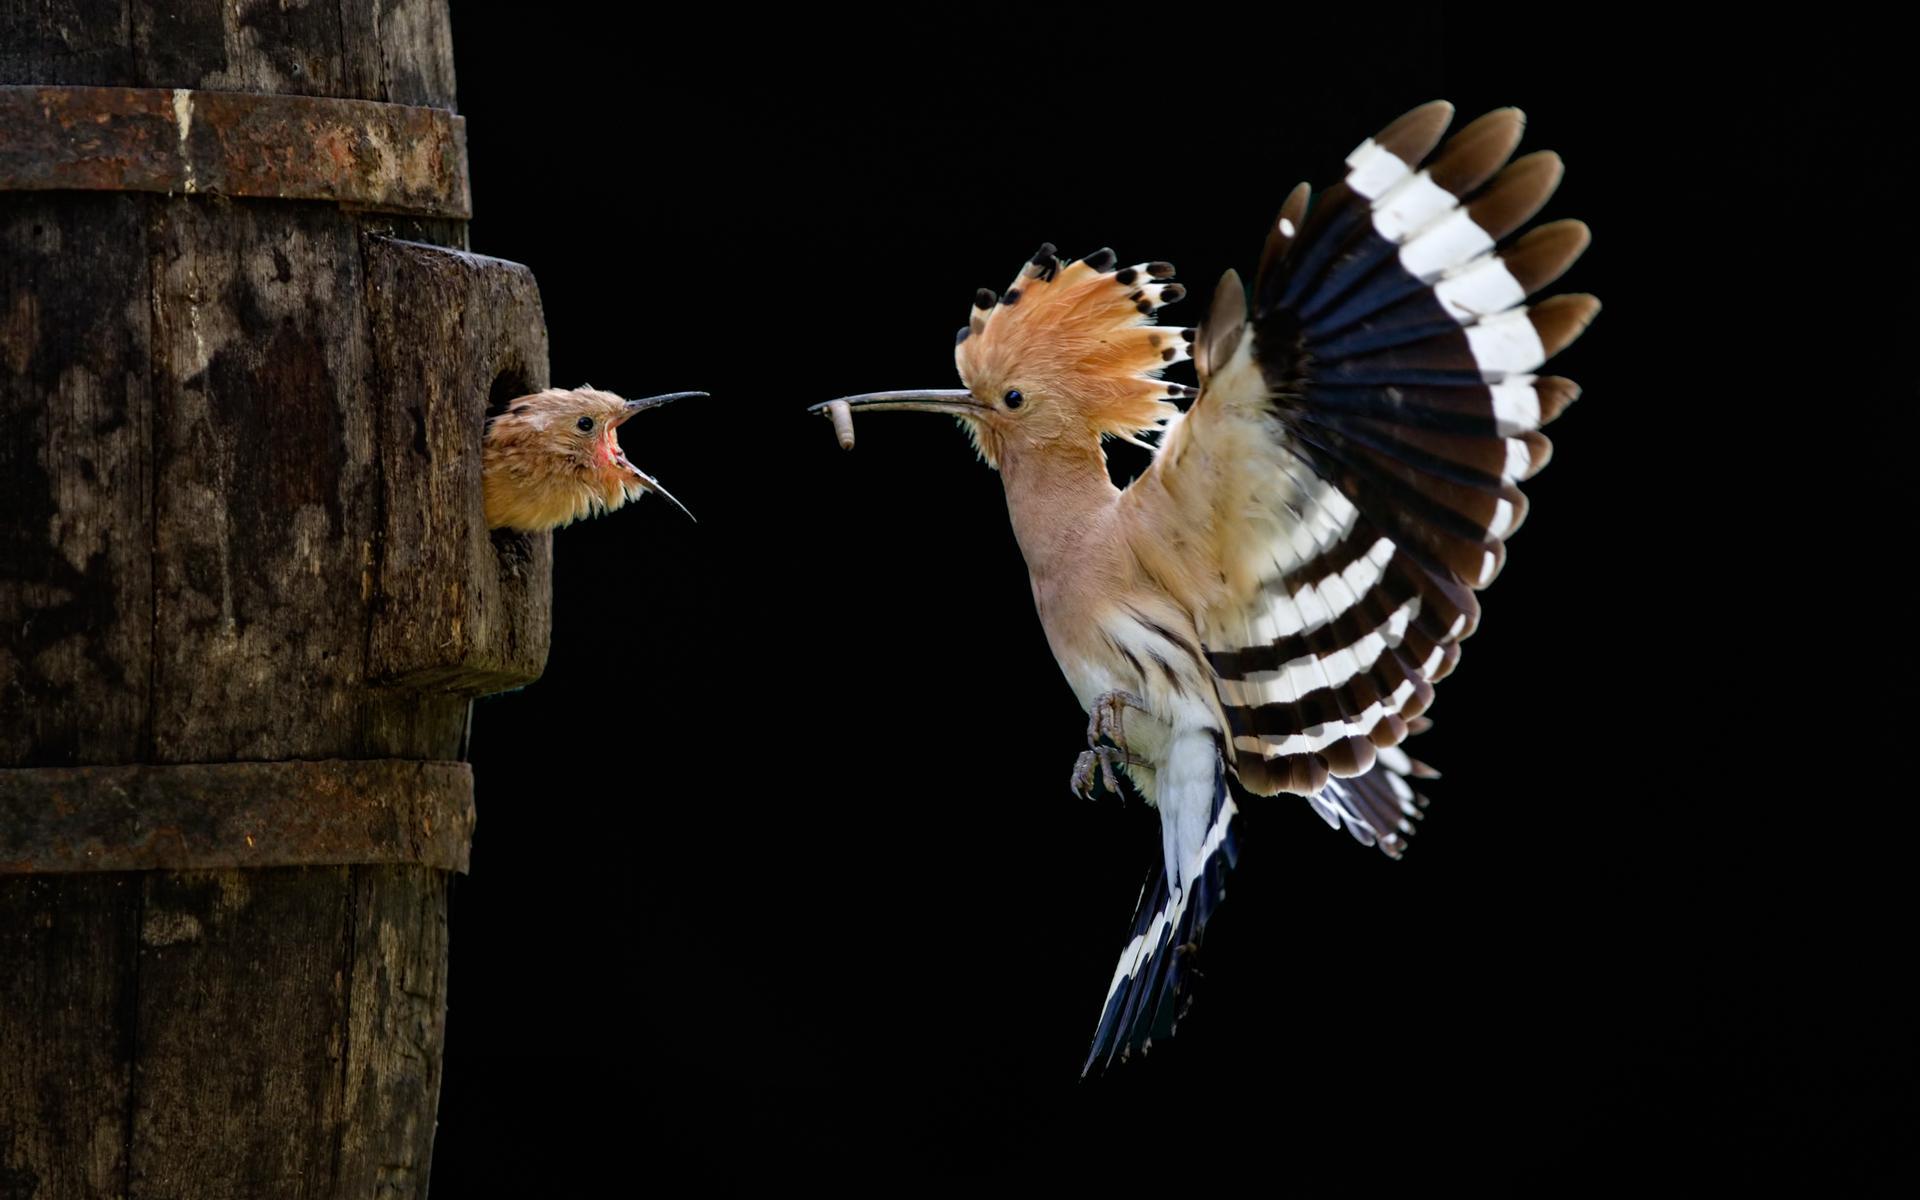 bird_feeding_baby_in_nest